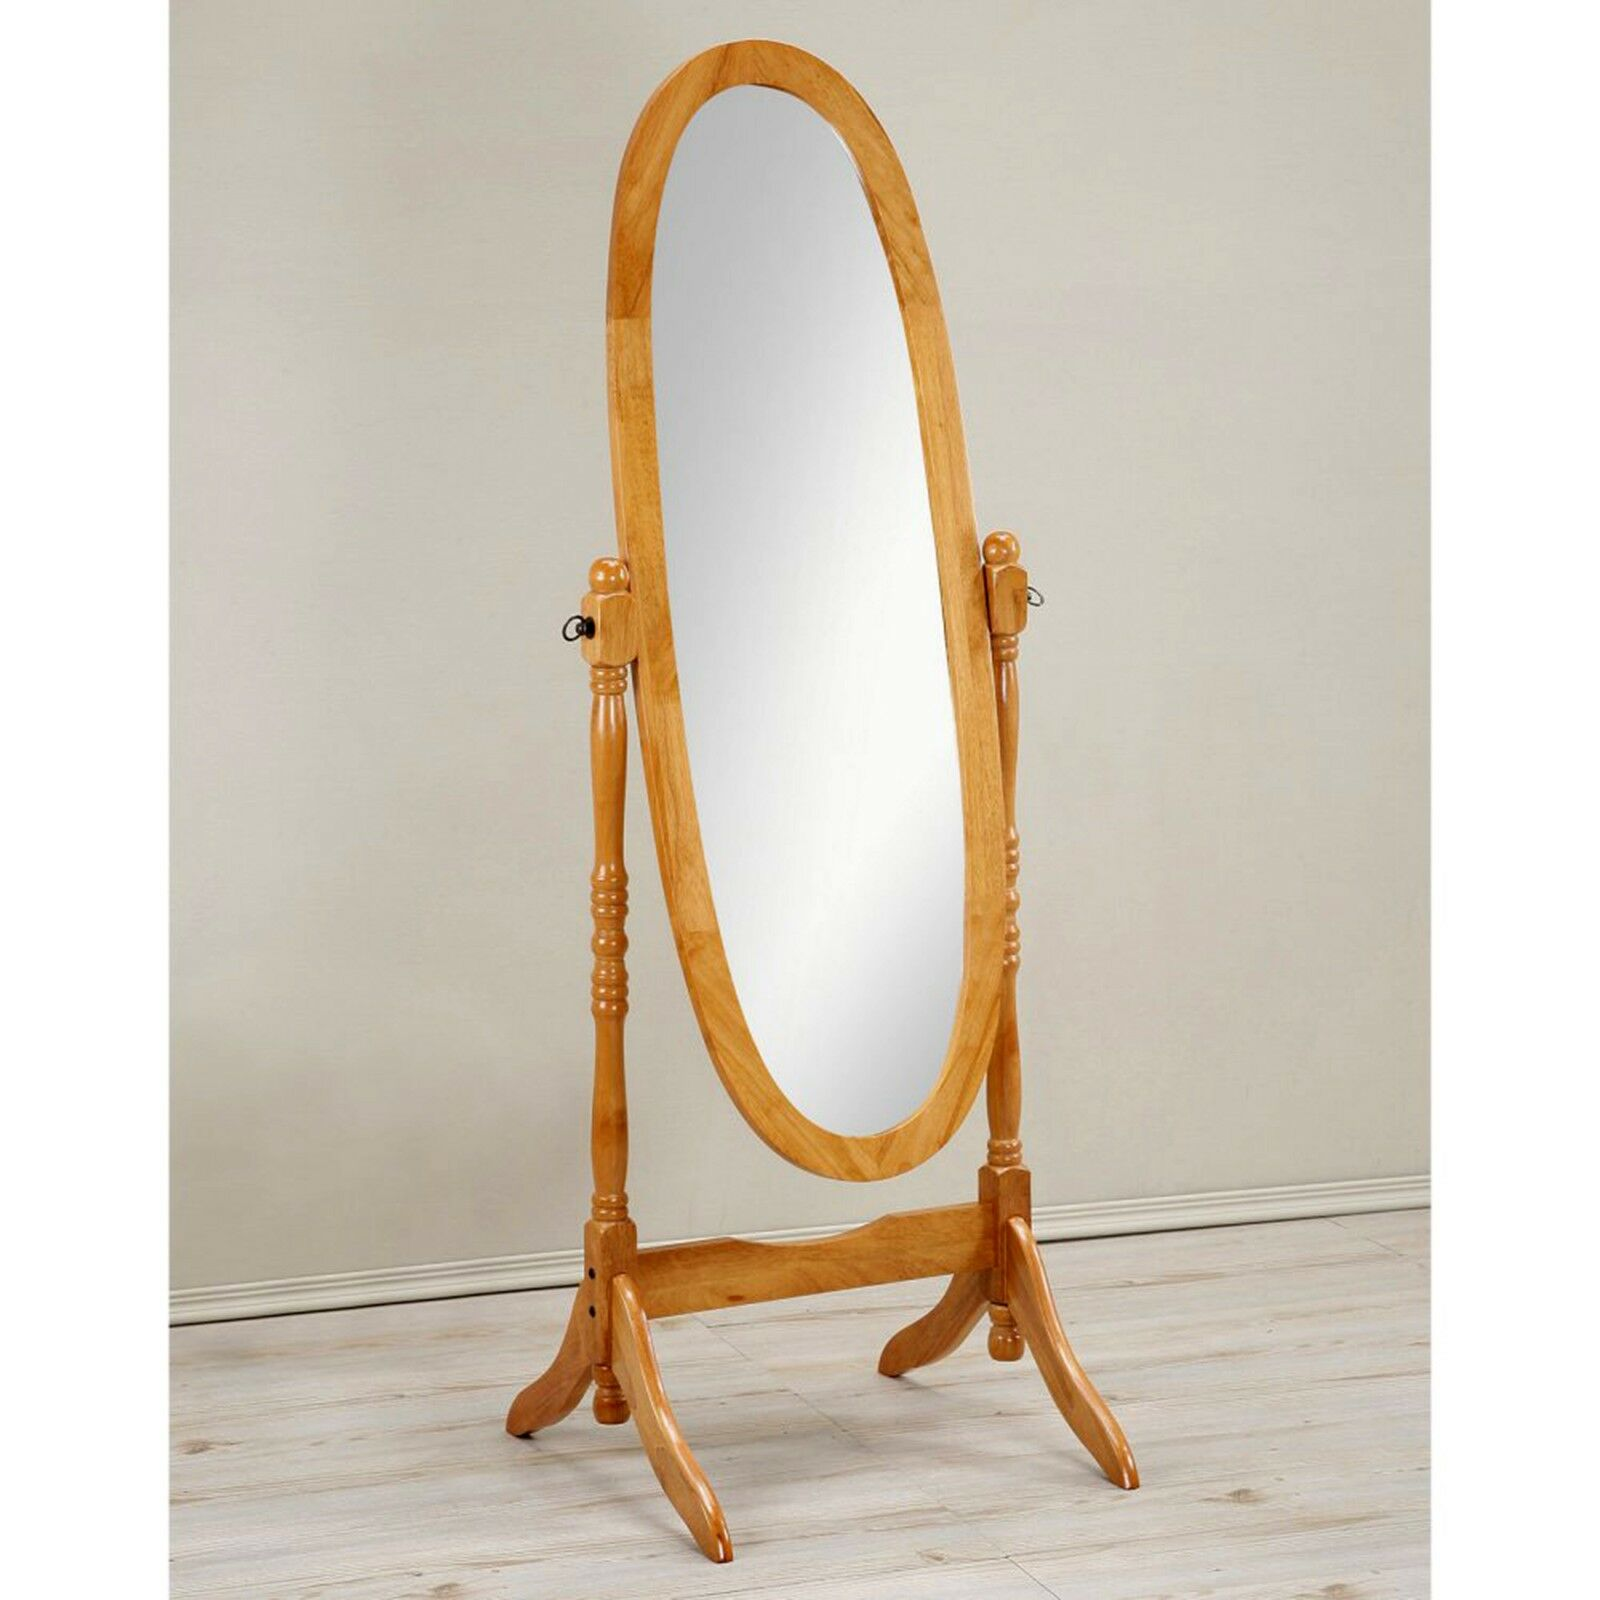 Cheval Floor Mirror Wood Full Length Oval Shape Free Standing Wooden Large Oak Ebay